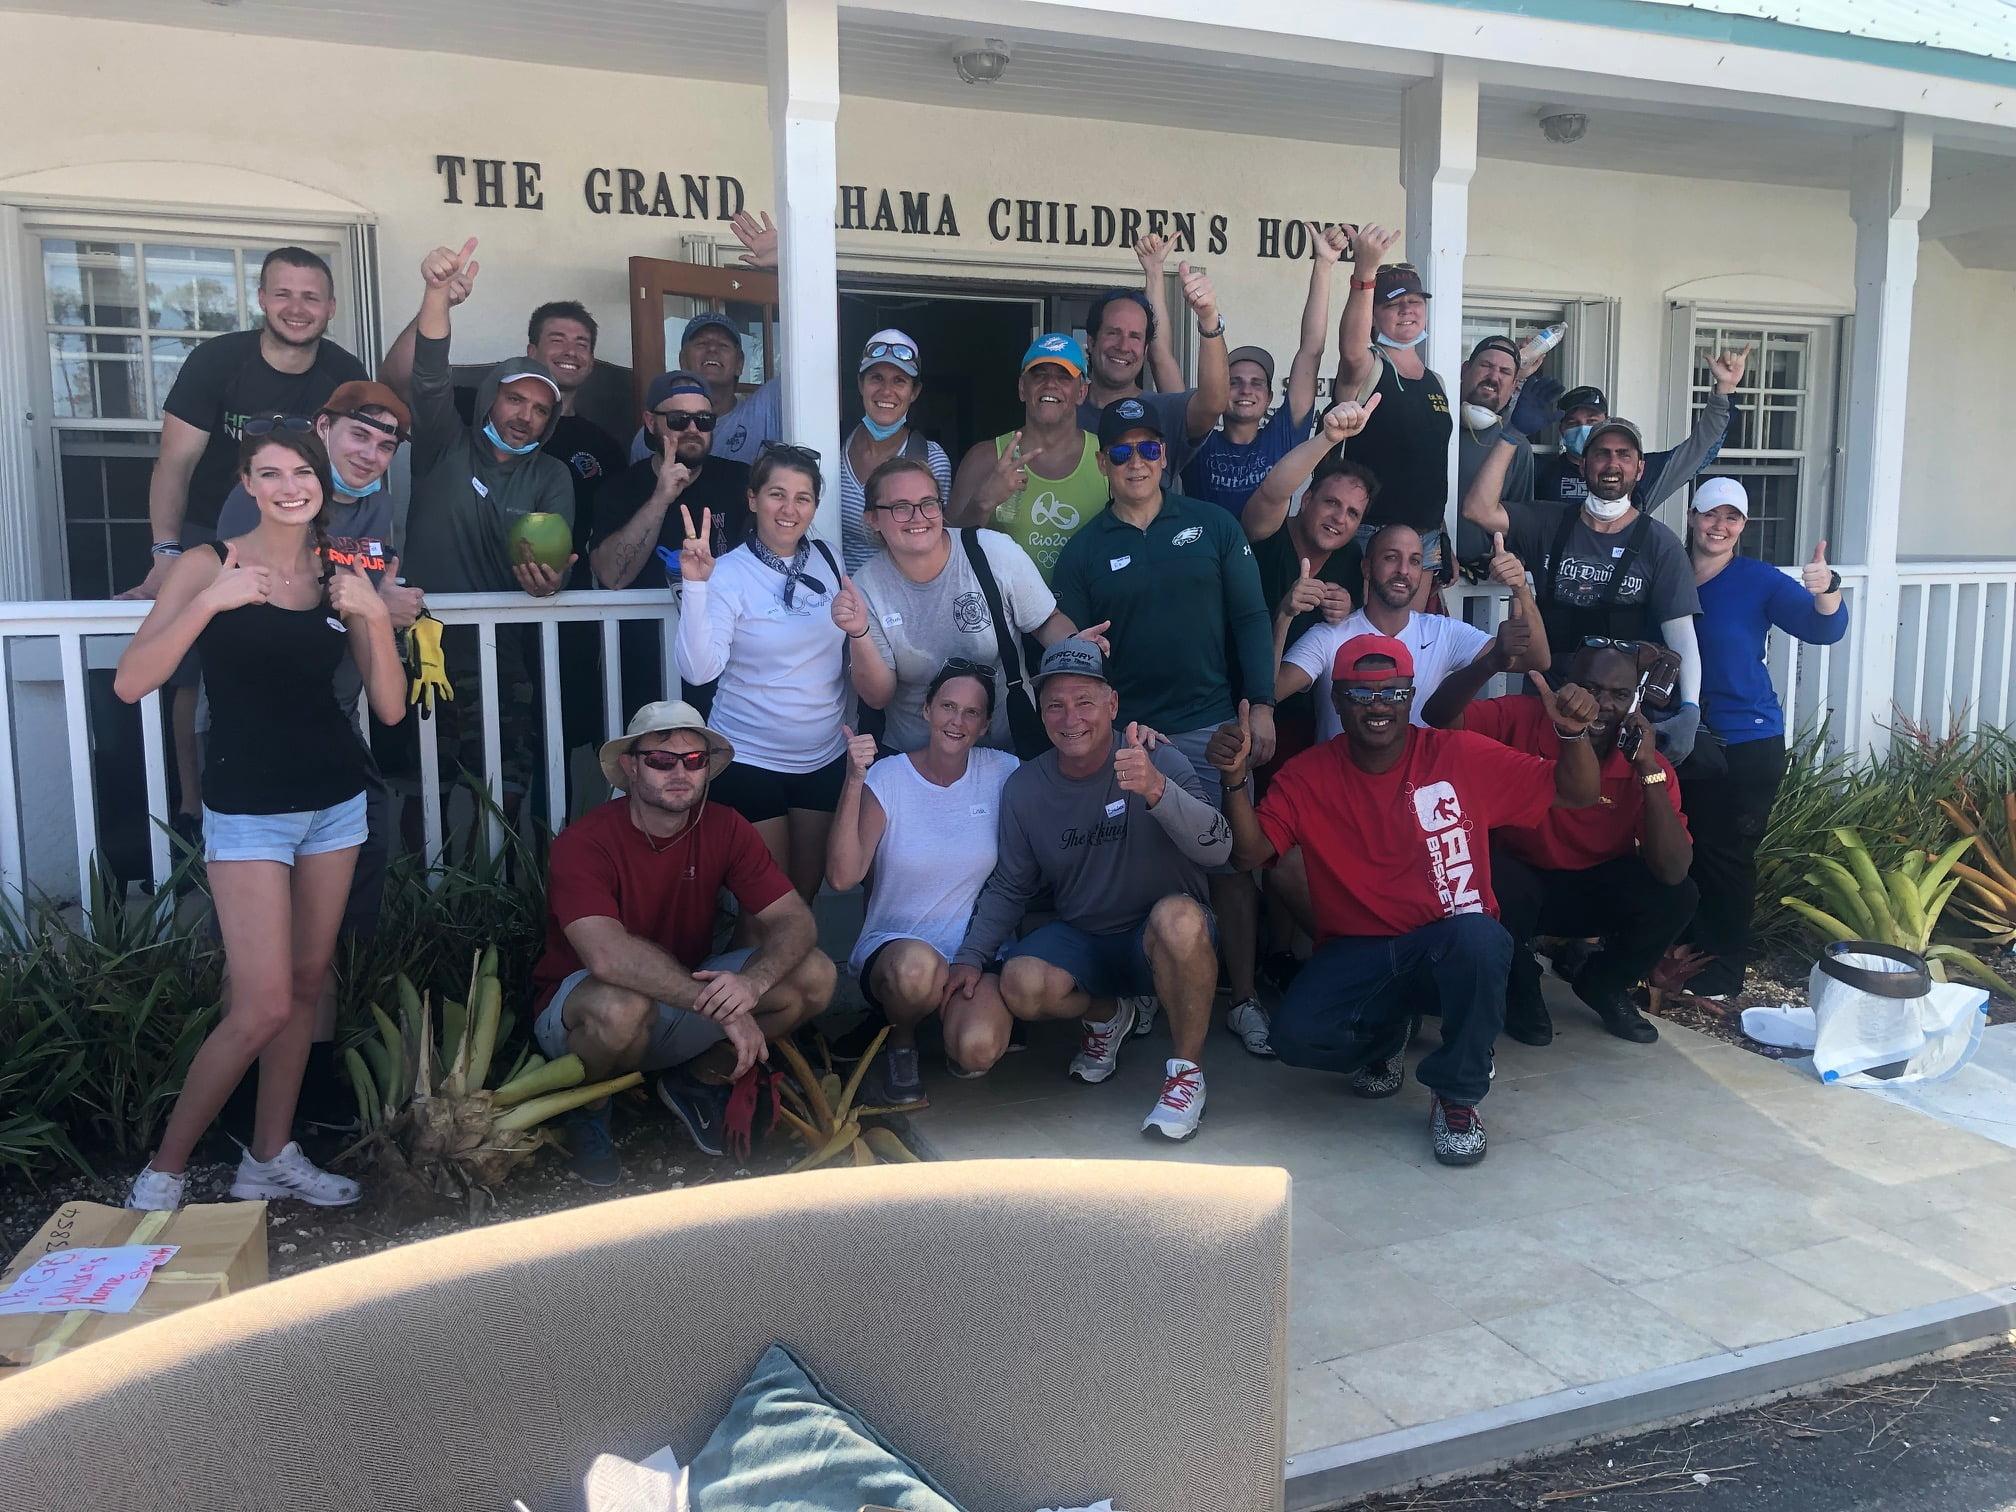 Grand Bahama Children's Home devastated by Dorian